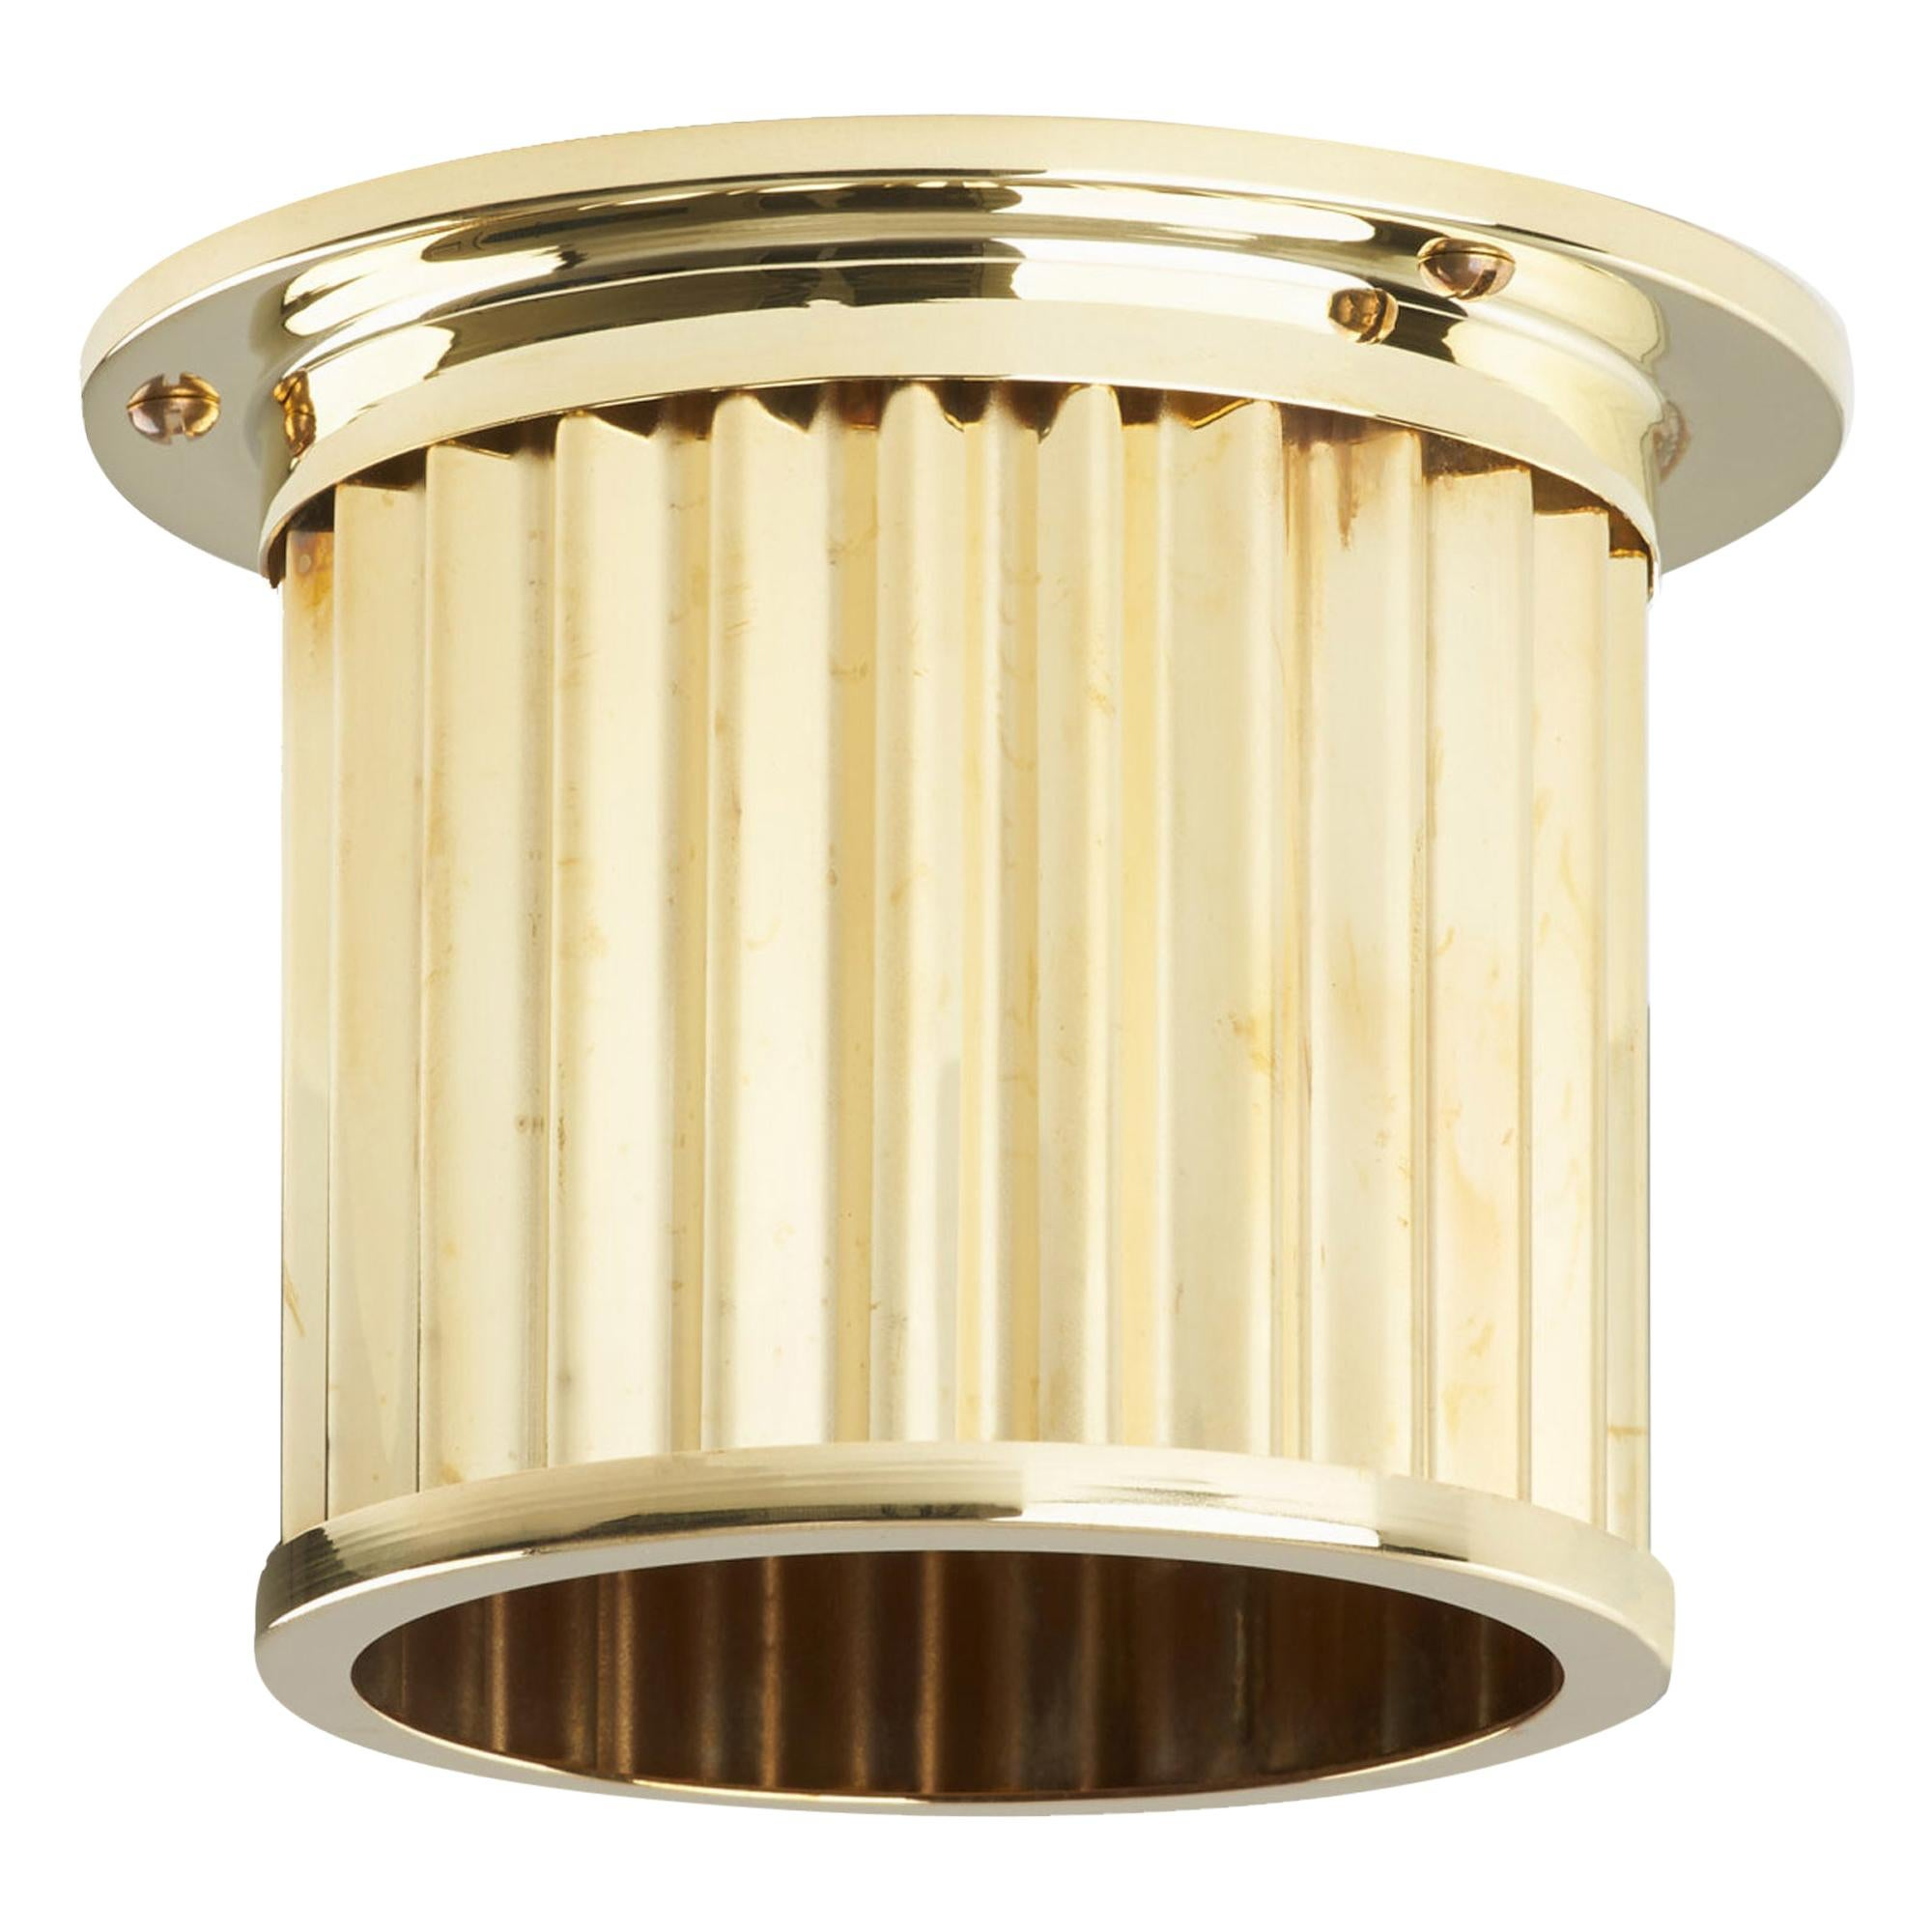 Littleton End Cap Spot Diffuser, Polished Brass Recessed Spot Light Shade